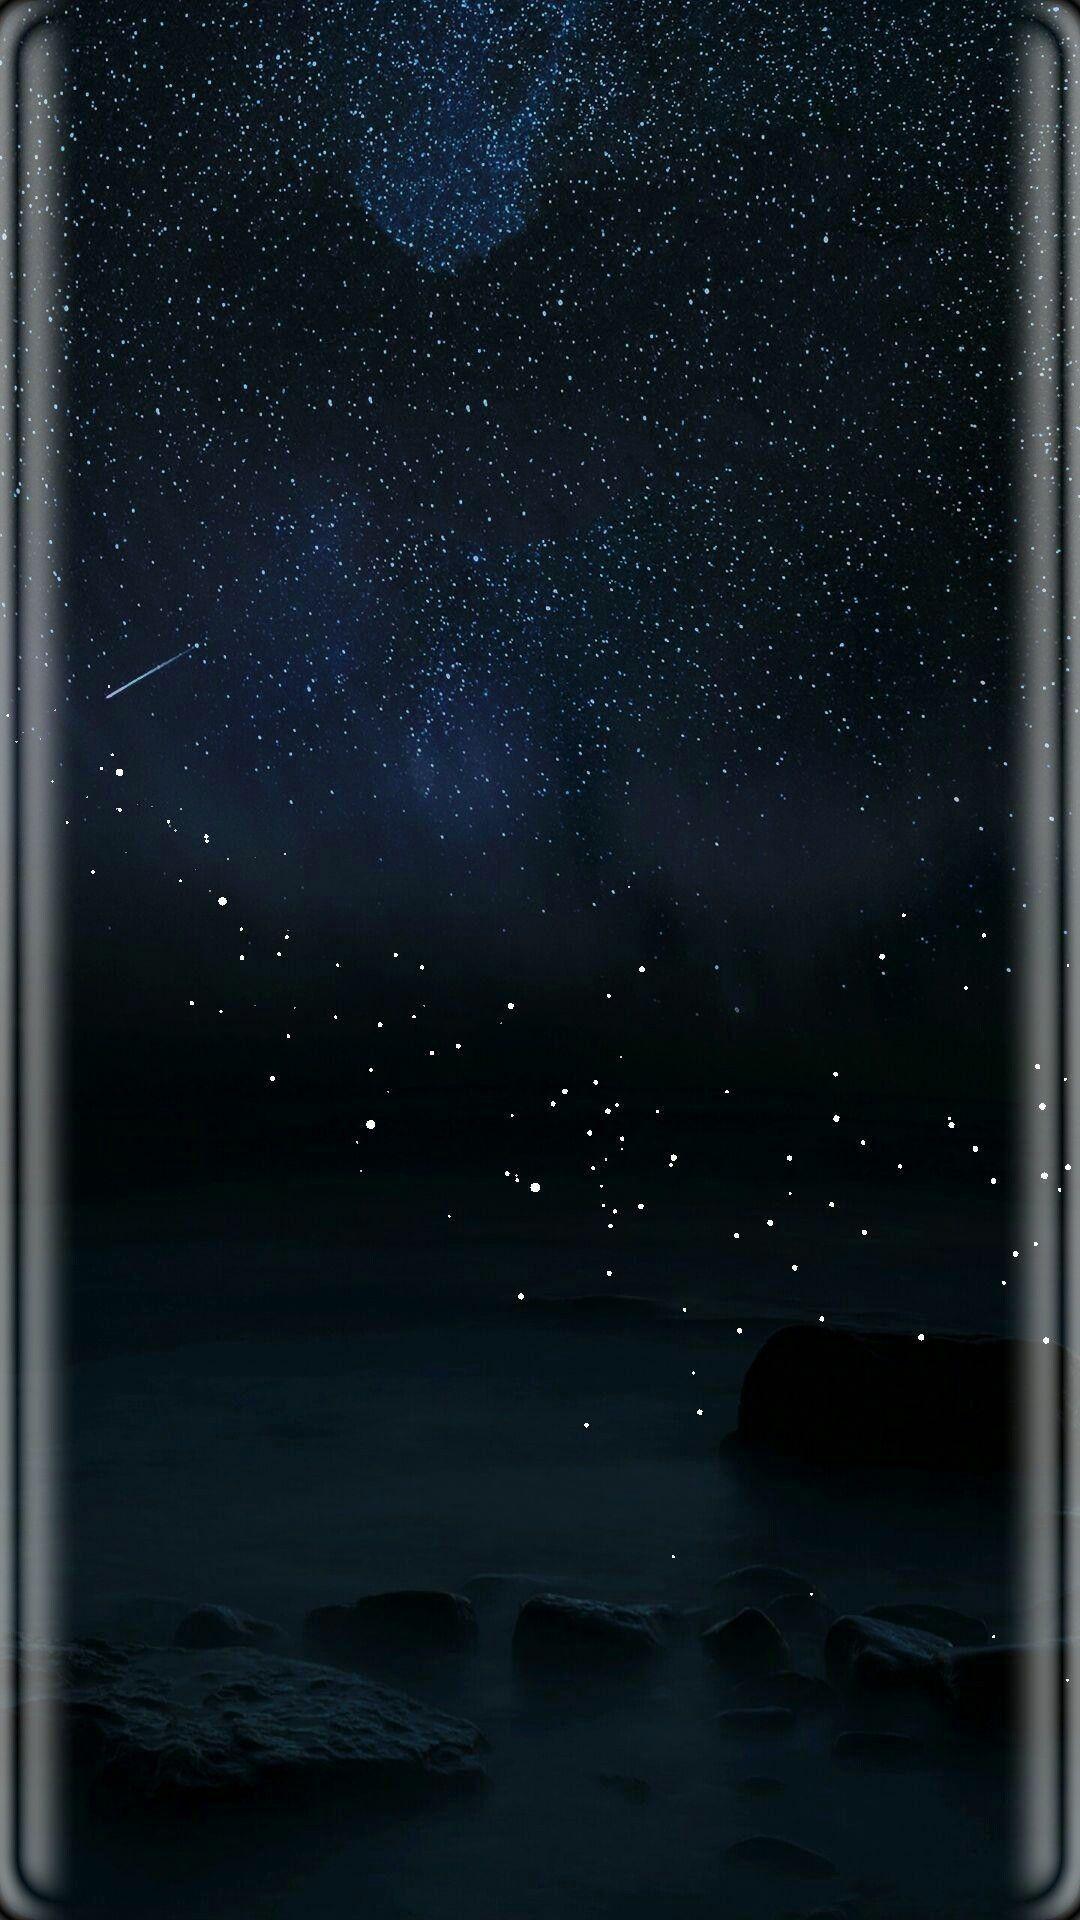 Gambar Galaxy wallpaper oleh Hadi Demir pada Samsung NOTE